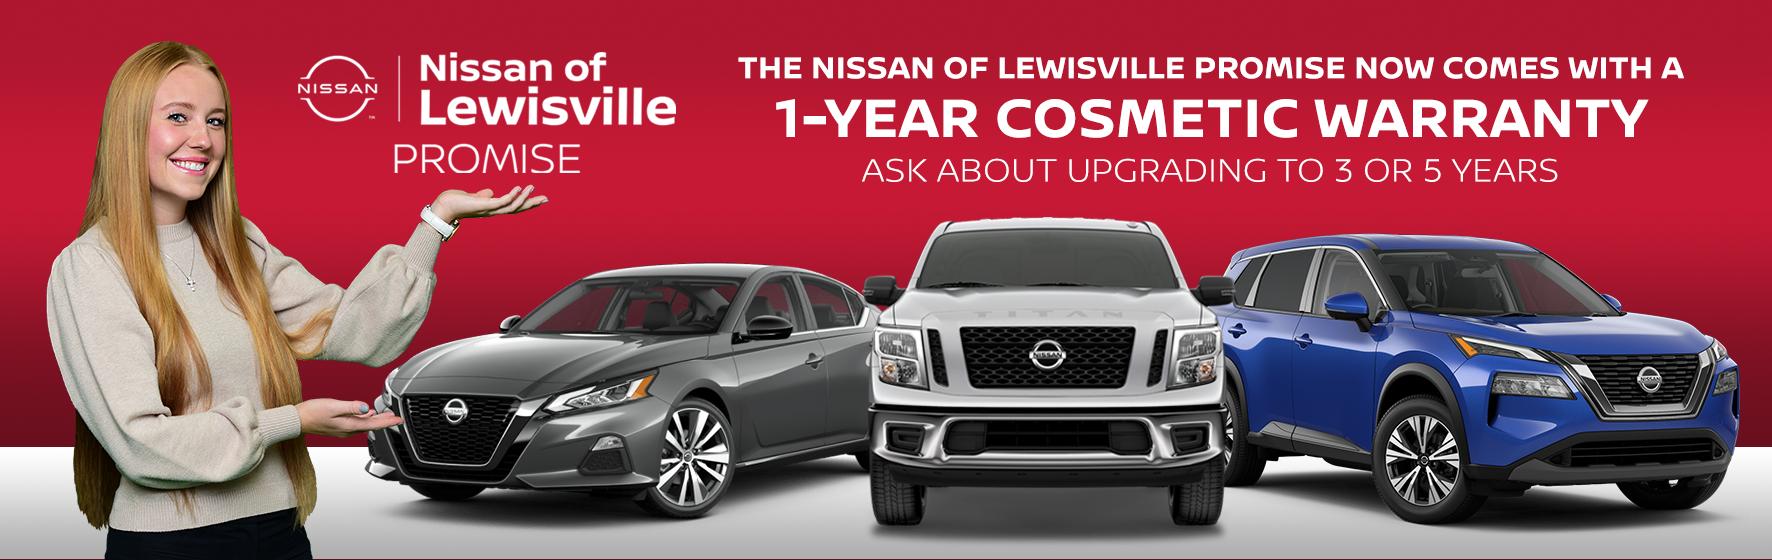 Nissan of Lewisville Customer Promise